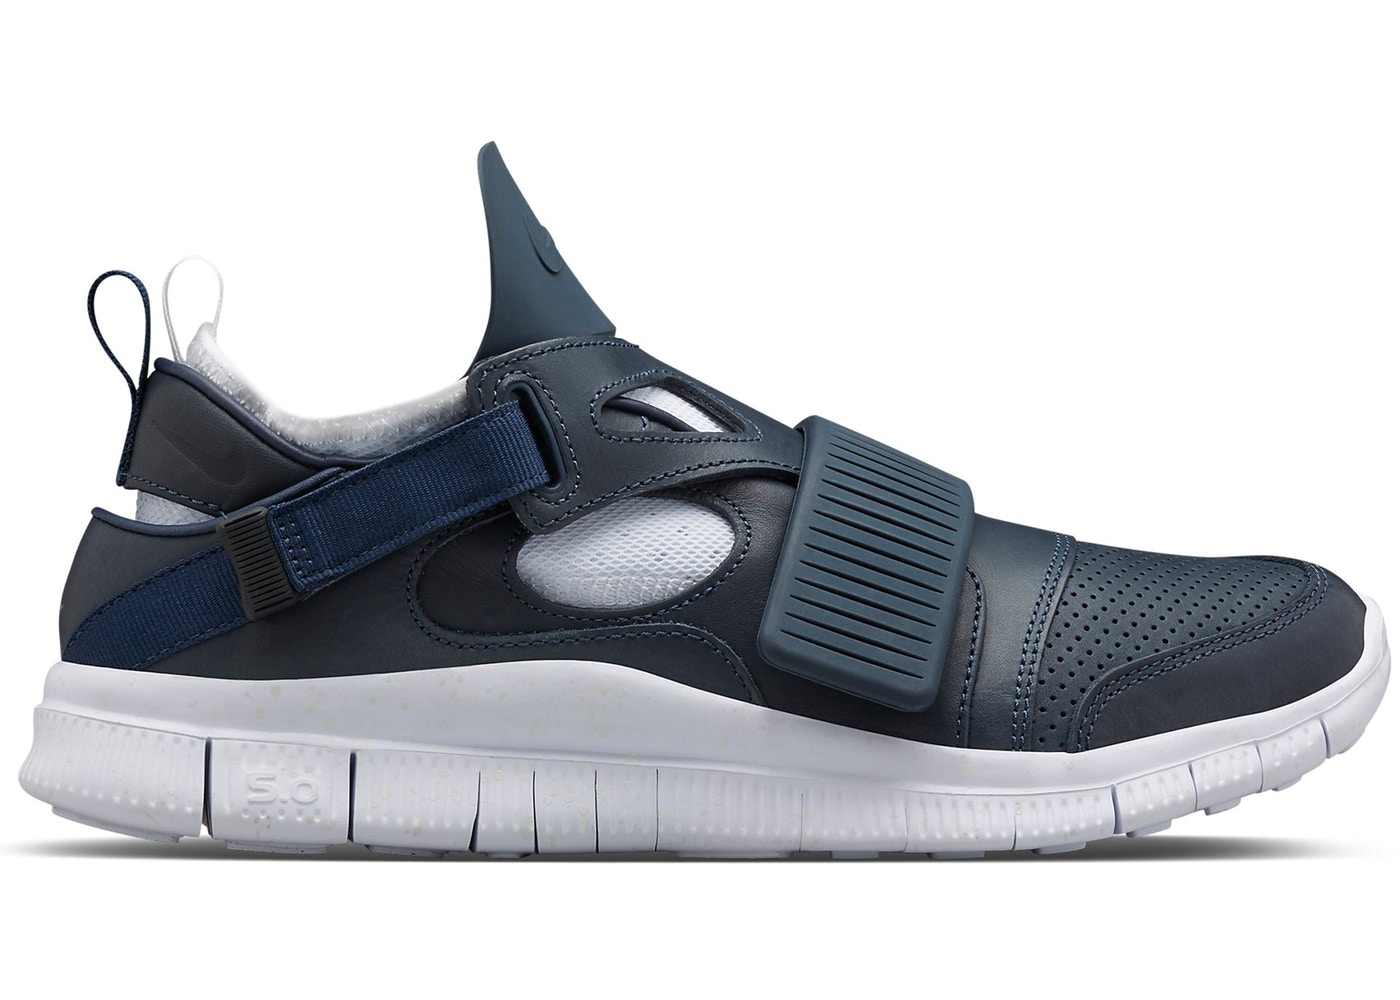 reputable site 0beb8 8e44d Nike Free Huarache Carnivore Obsidian White